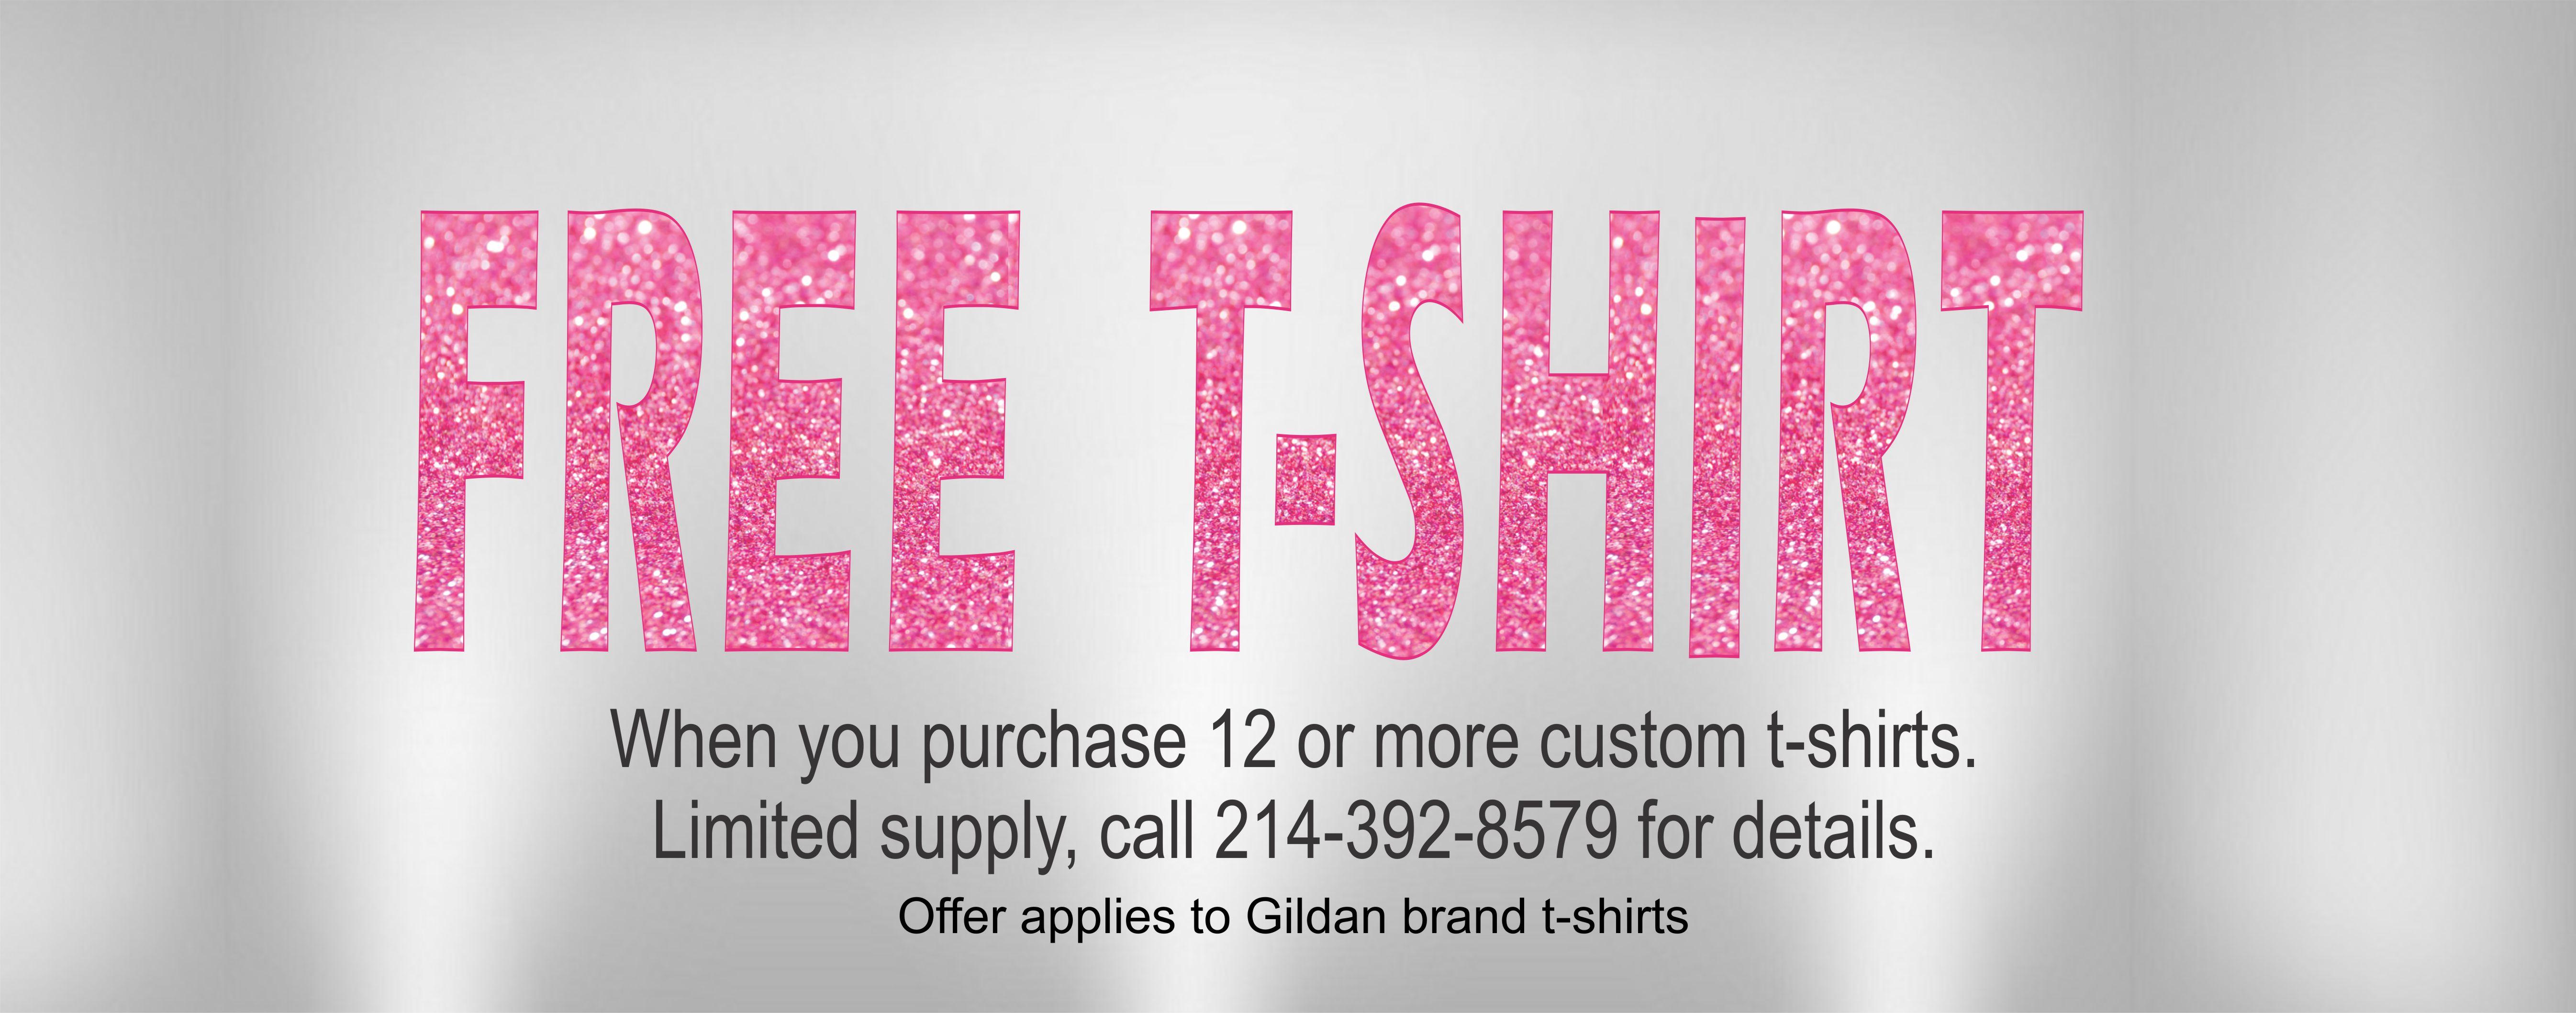 Exalted T Shirts Printing Custom Clothing